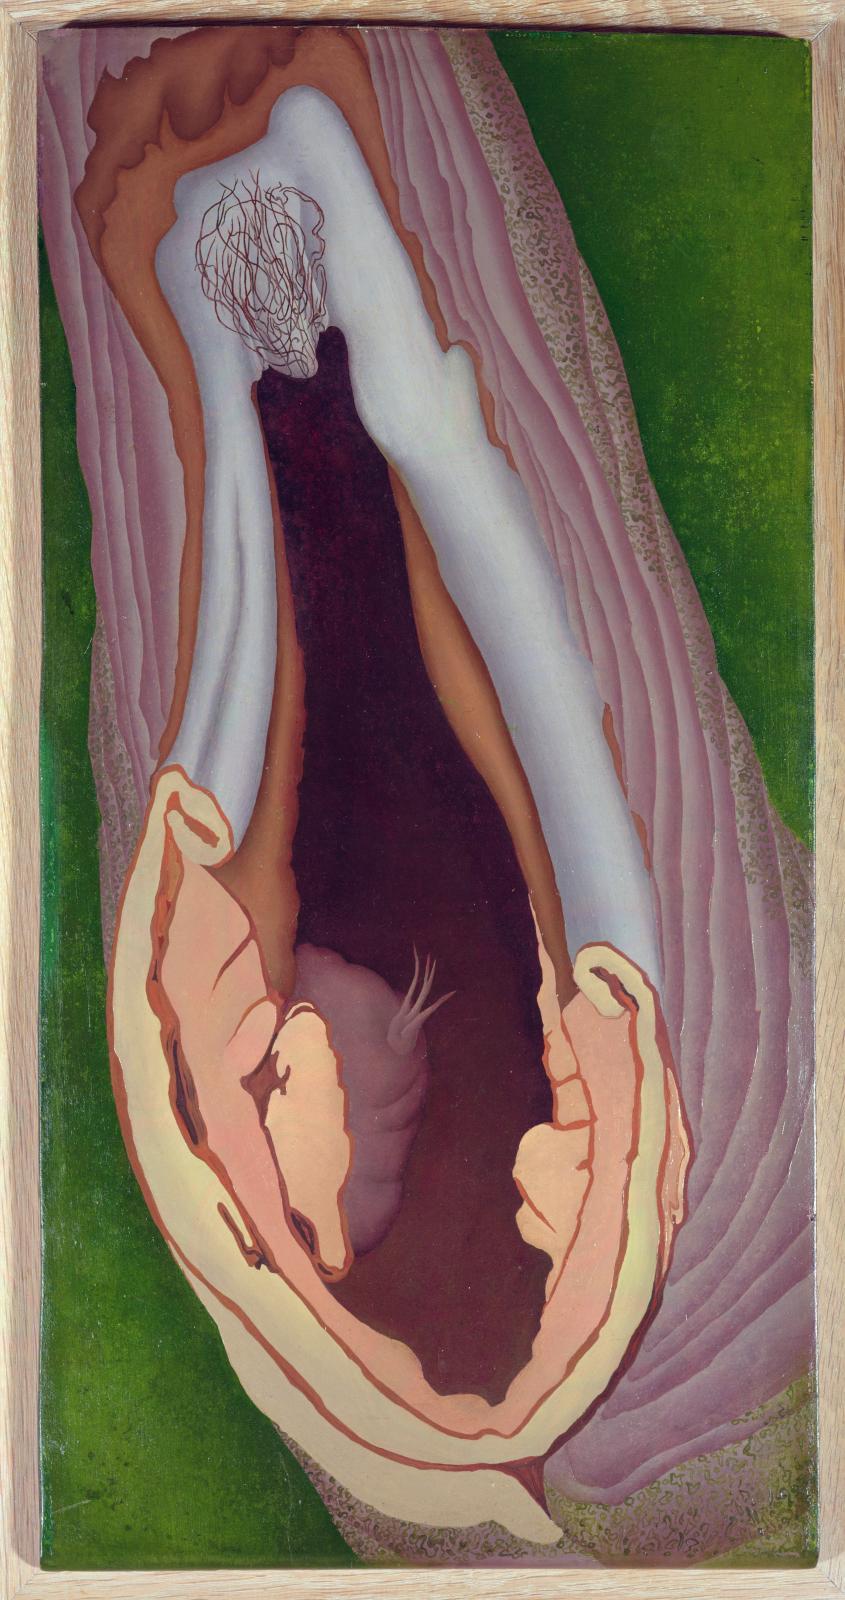 Ithell Colquhoun, Tree Anatomy, 1942, huile sur panneau, 57 x 29 cm, The Sherwin Collection, Leeds. © Bridgeman Images